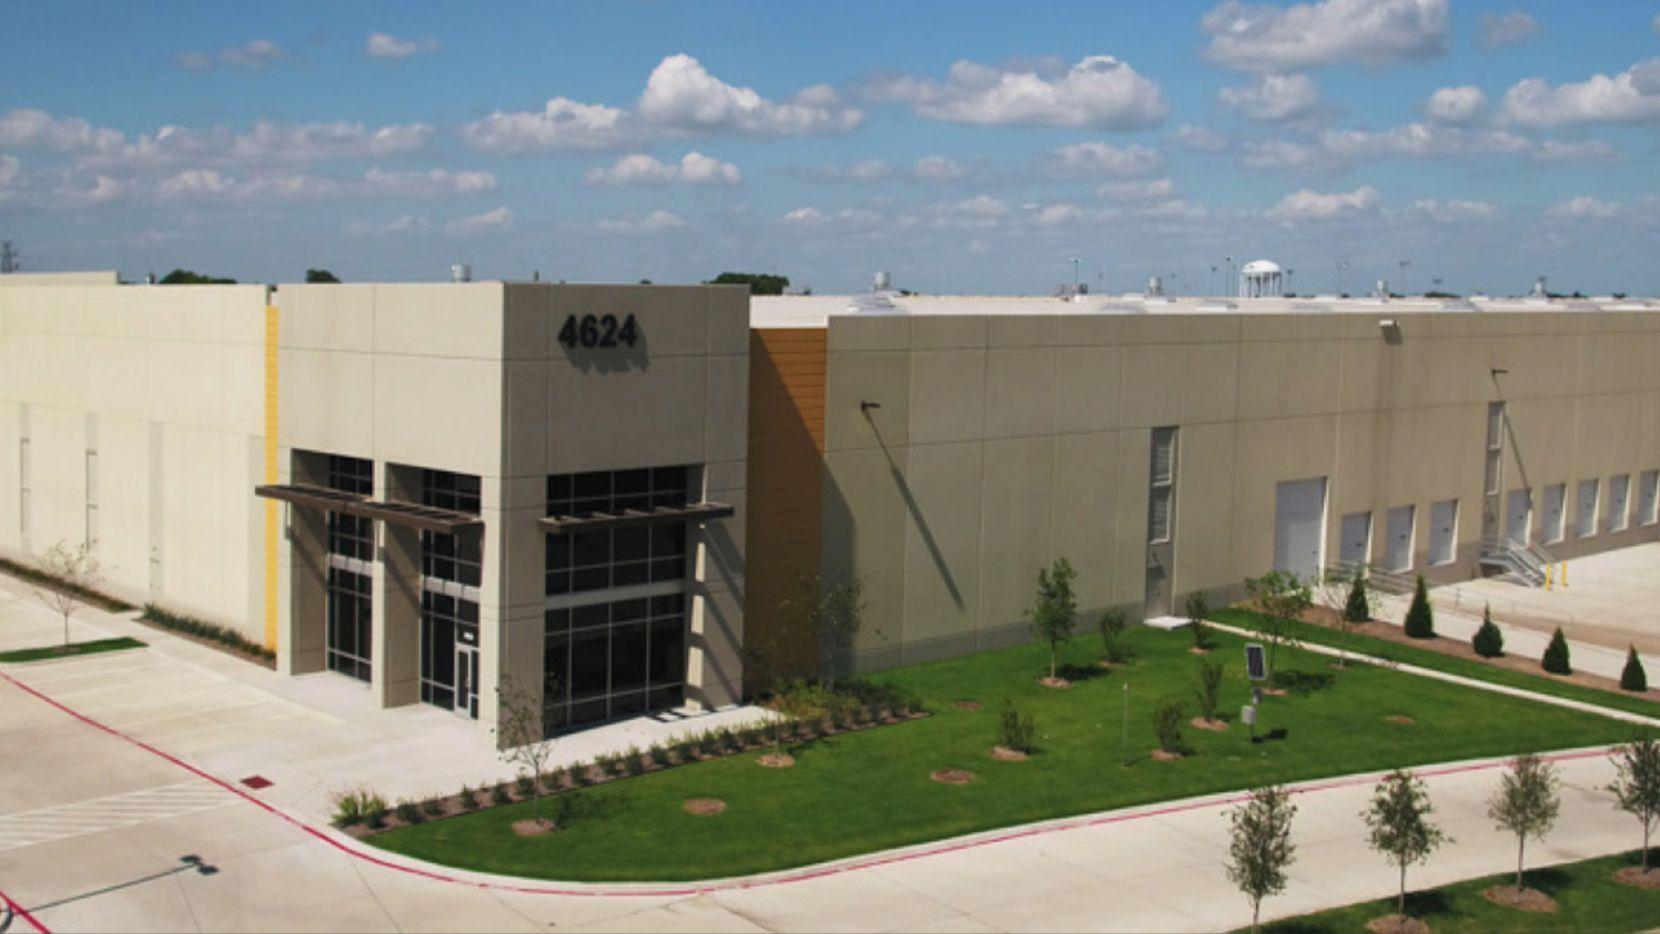 The developer recently built the Exeter Buckner business park is in Far East Dallas.